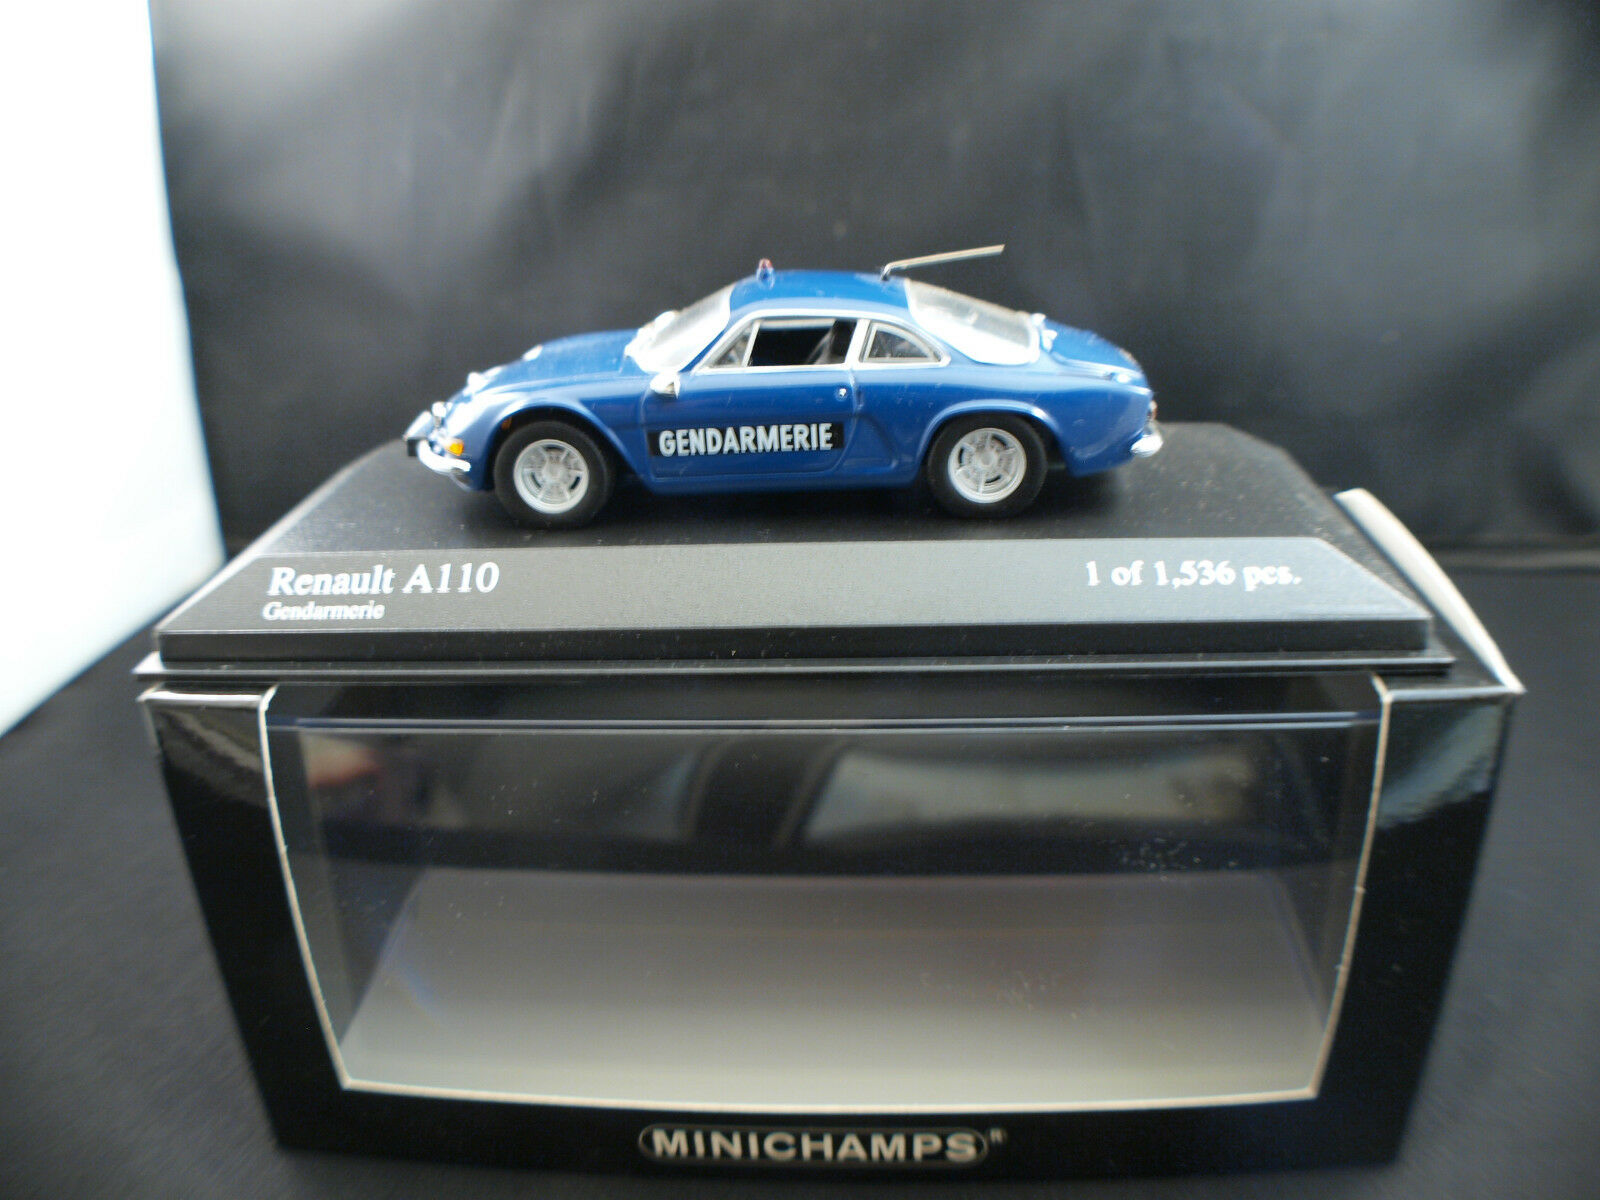 Minichamps n° 430 113690 Renault A110 Gendarmerie neuf boite 1 43 edn limitée